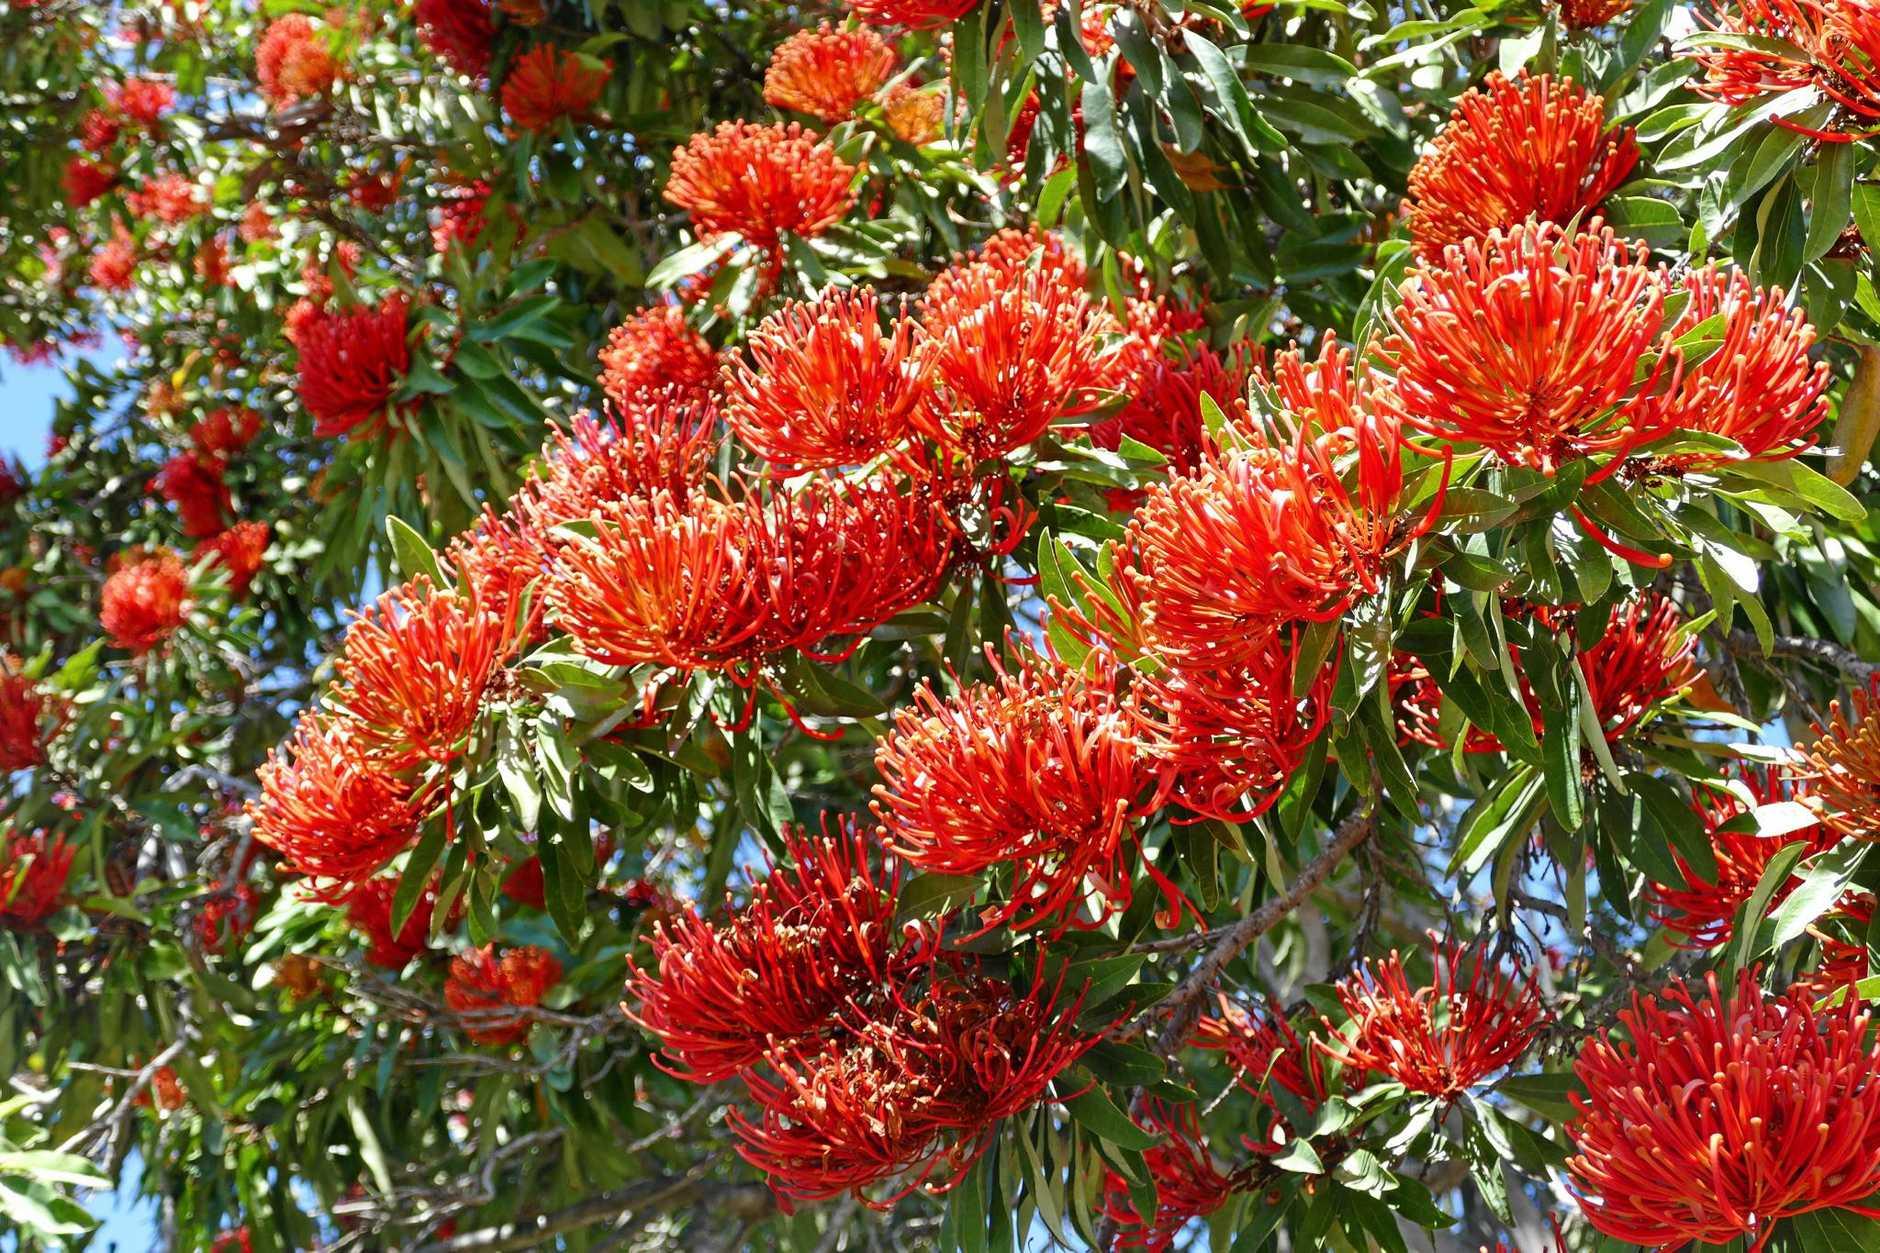 Detail of the beautiful Waratah flowers.